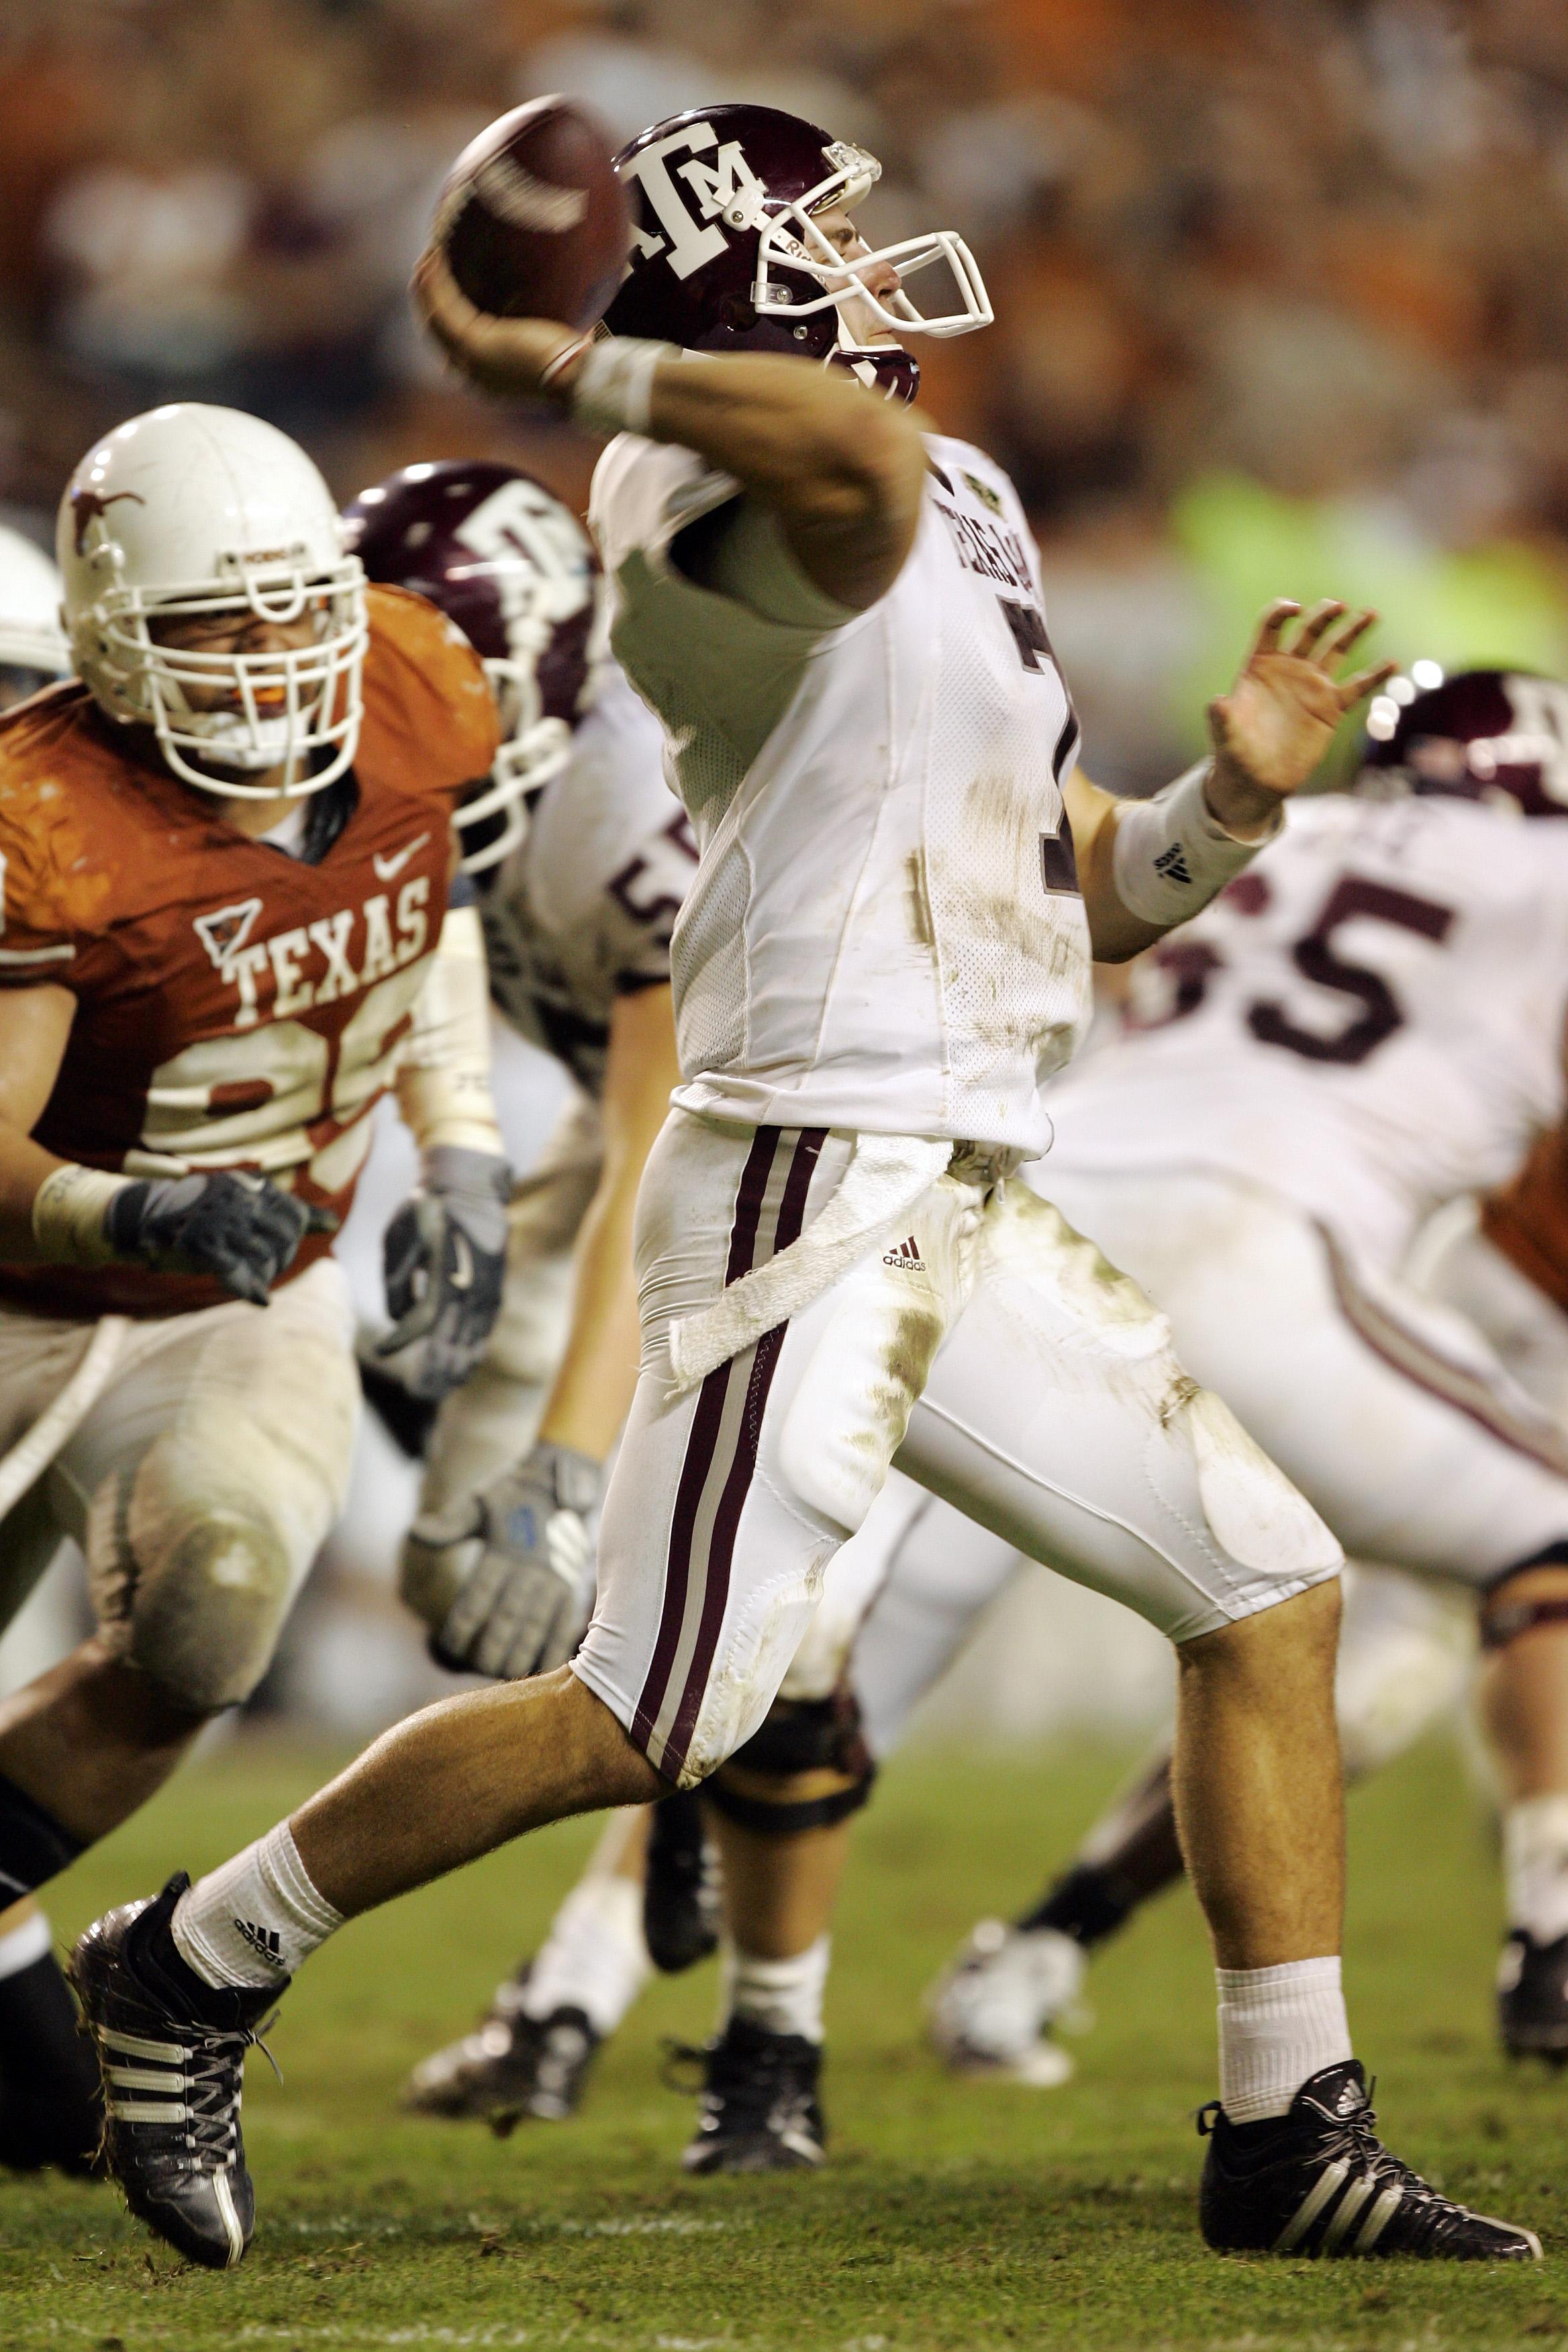 AUSTIN, TX - NOVEMBER 27:  Quarterback Stephen McGee #7 of the Texas A&M Aggies throws against the Texas Longhorns at Darrell K Royal-Texas Memorial Stadium November 27, 2008 in Austin, Texas.  Texas won 49-9.  (Photo by Brian Bahr/Getty Images)